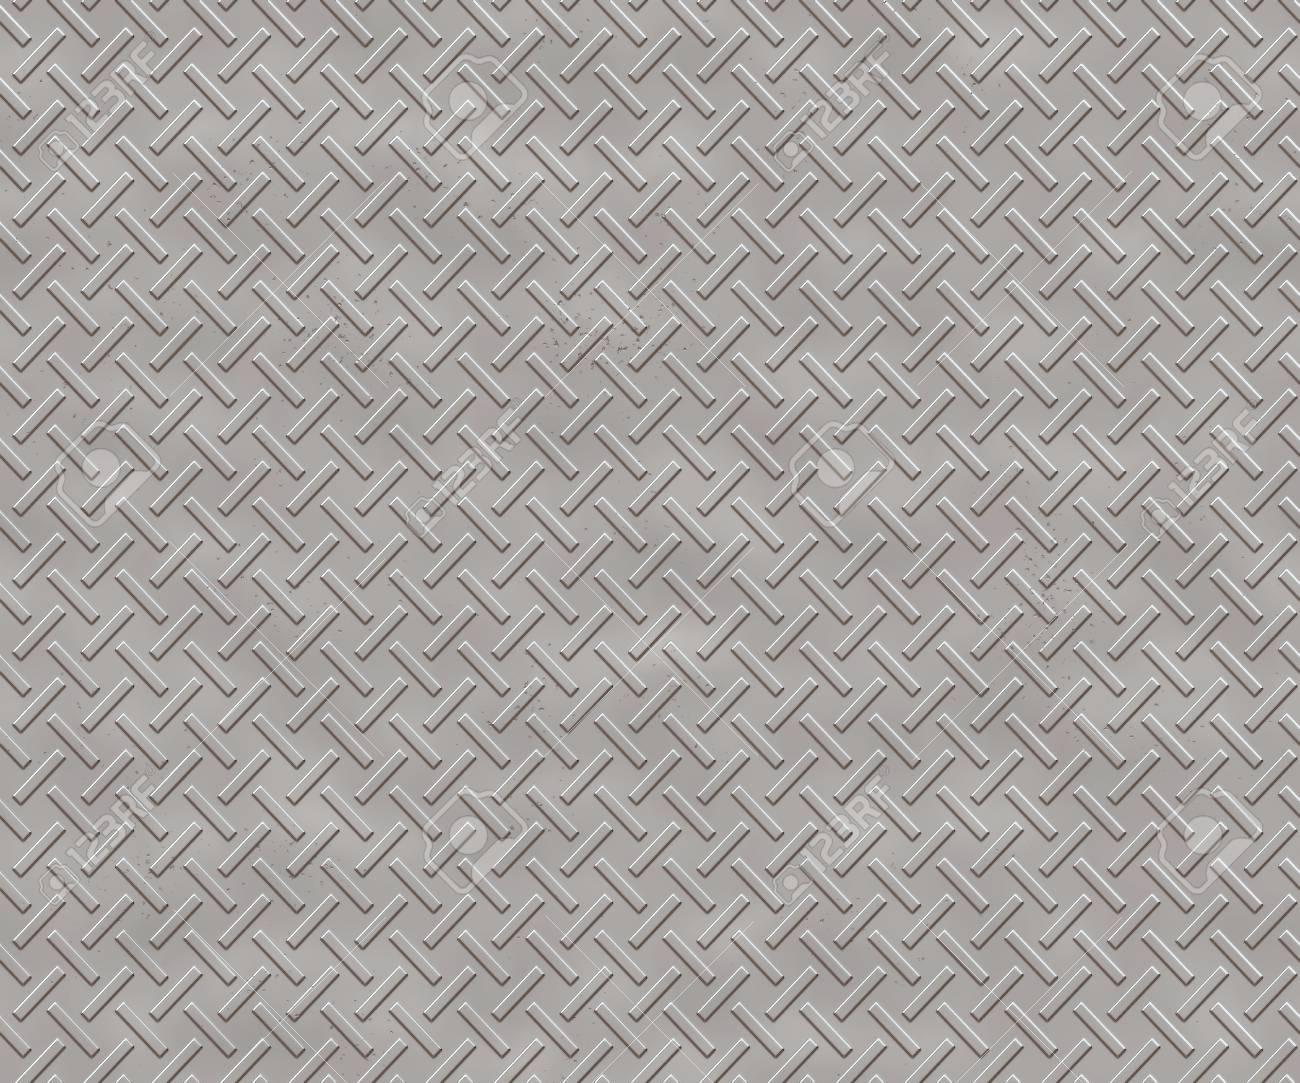 metal texture (diamond plate) Stock Photo - 10183195